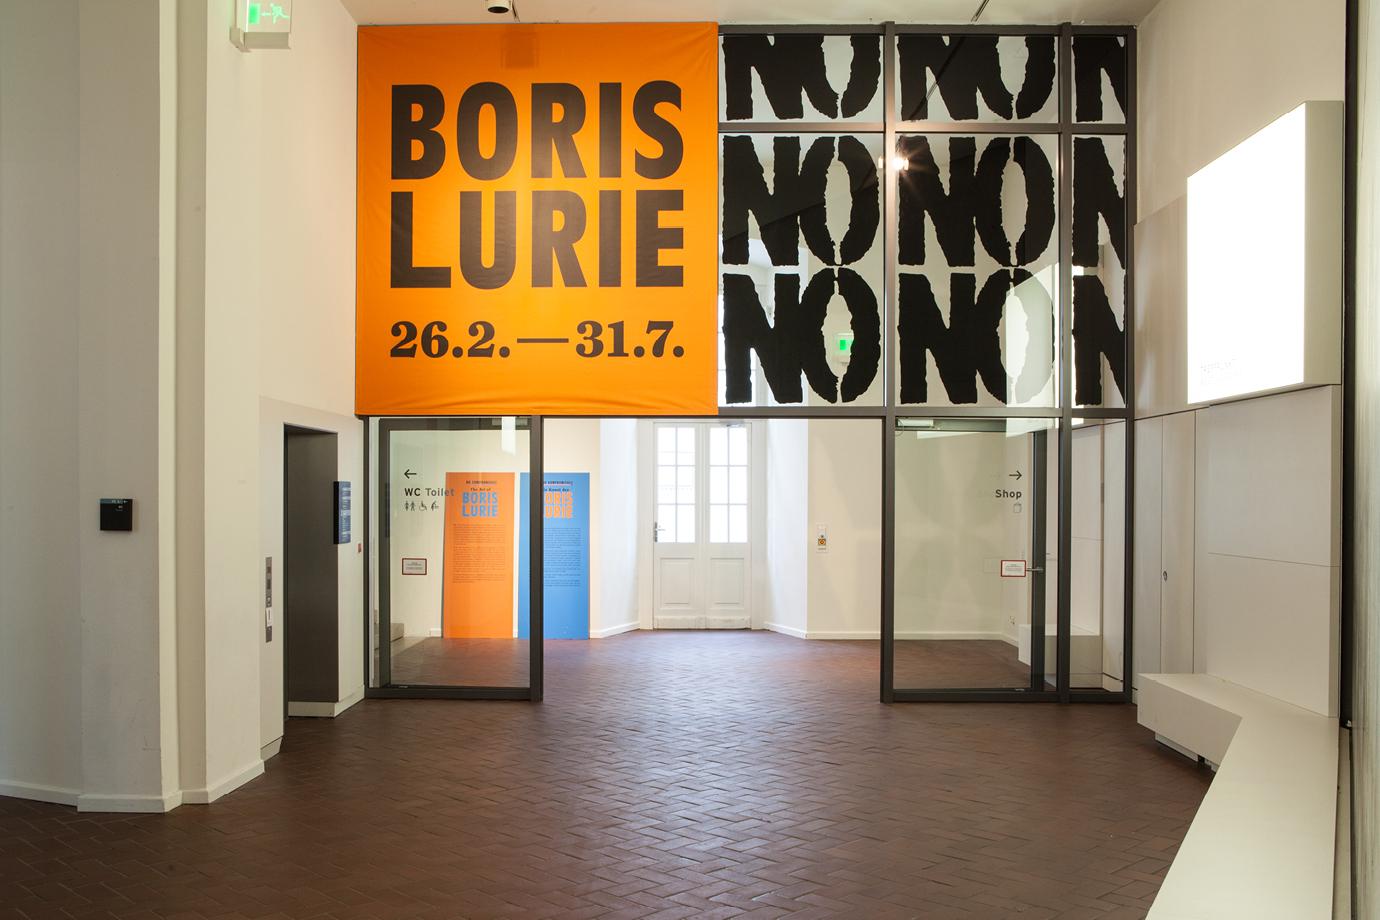 http://e-o-t.de/wordpress/wp-content/uploads/2017/03/Slide-Exhibition_Lurie_1.jpg